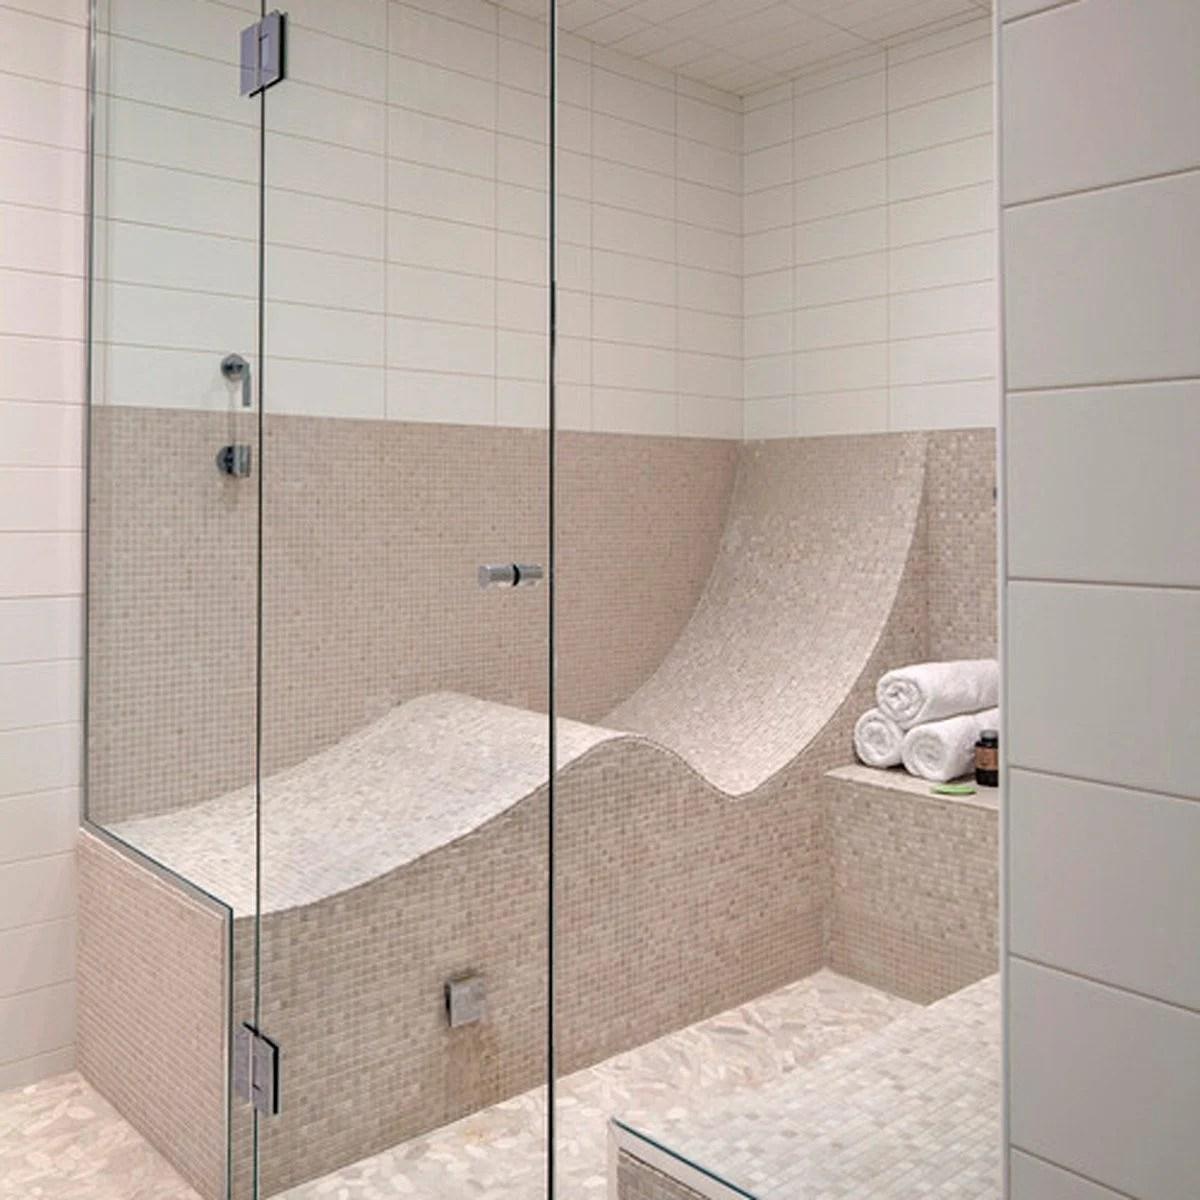 15 Incredible Steam Shower Ideas Family Handyman